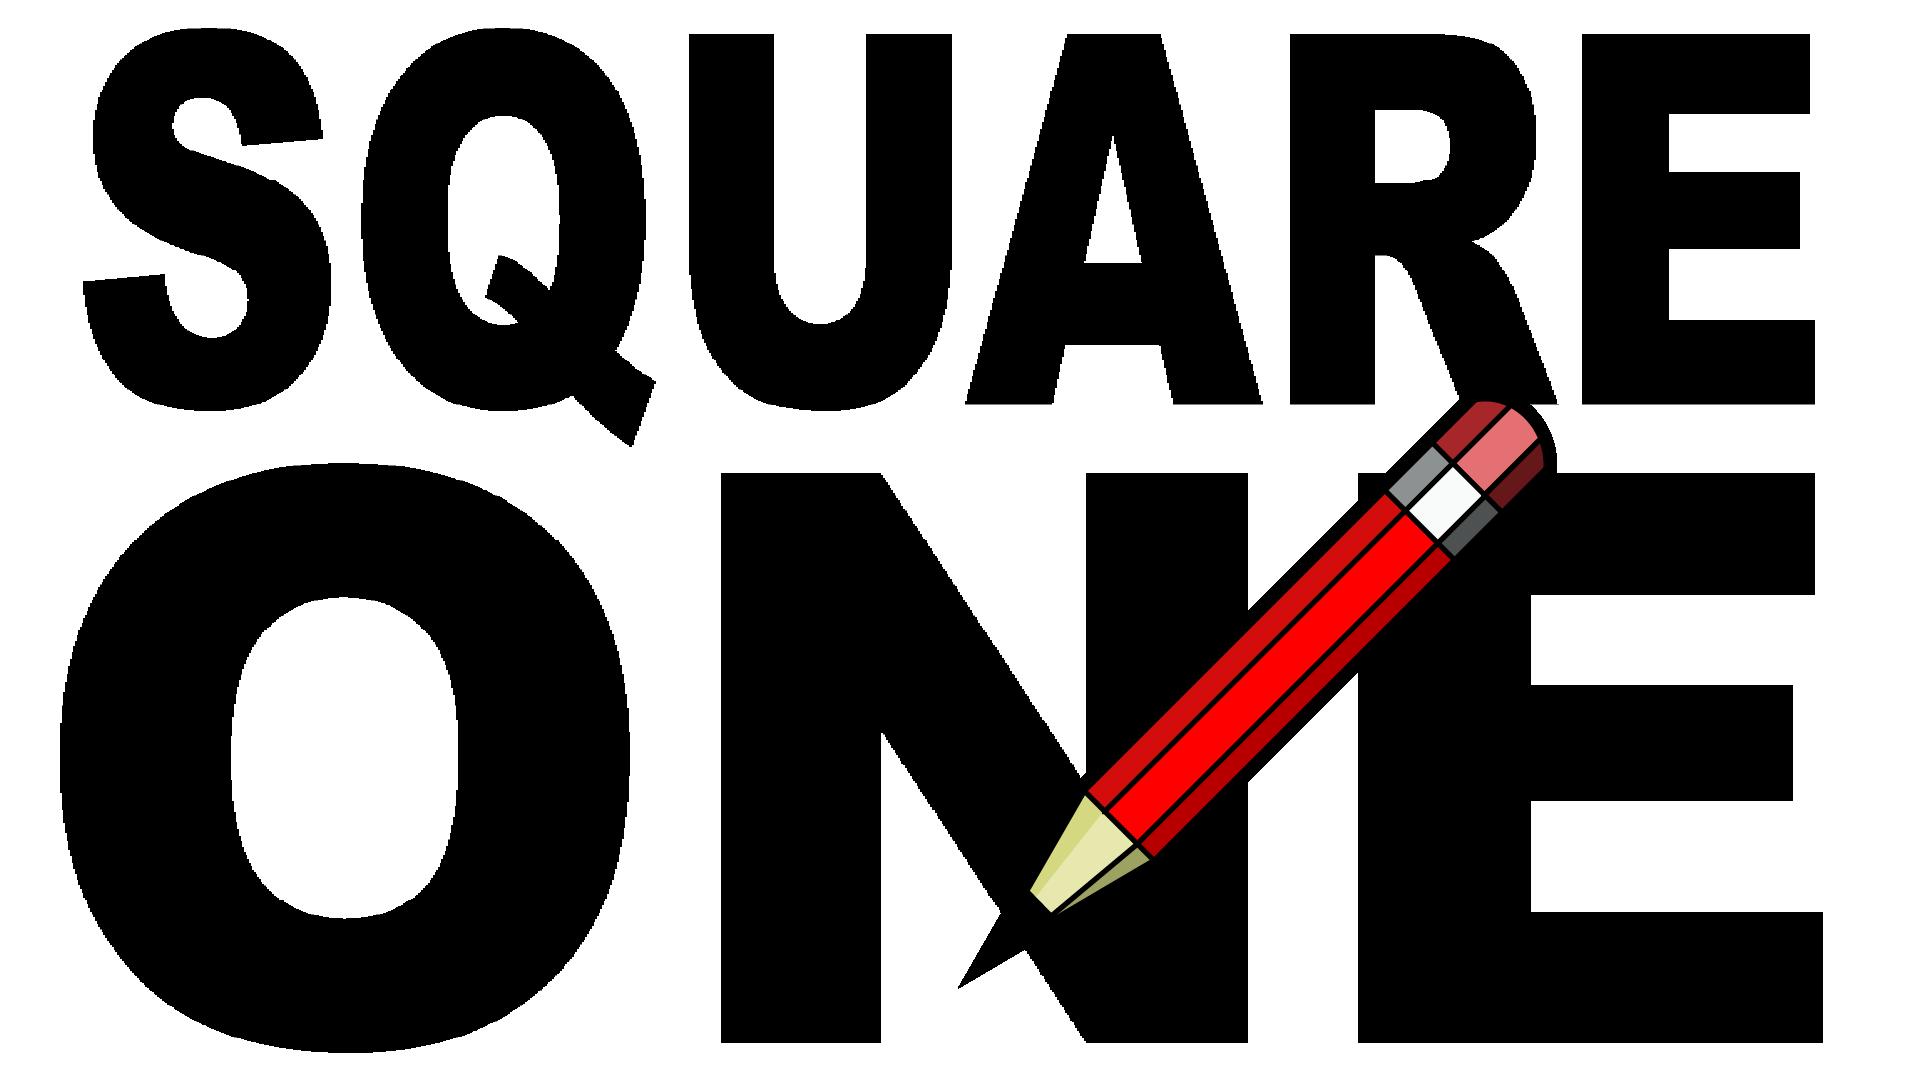 100 Sketchup Skill Builders Ideas In 2020 Skills Builder Learning